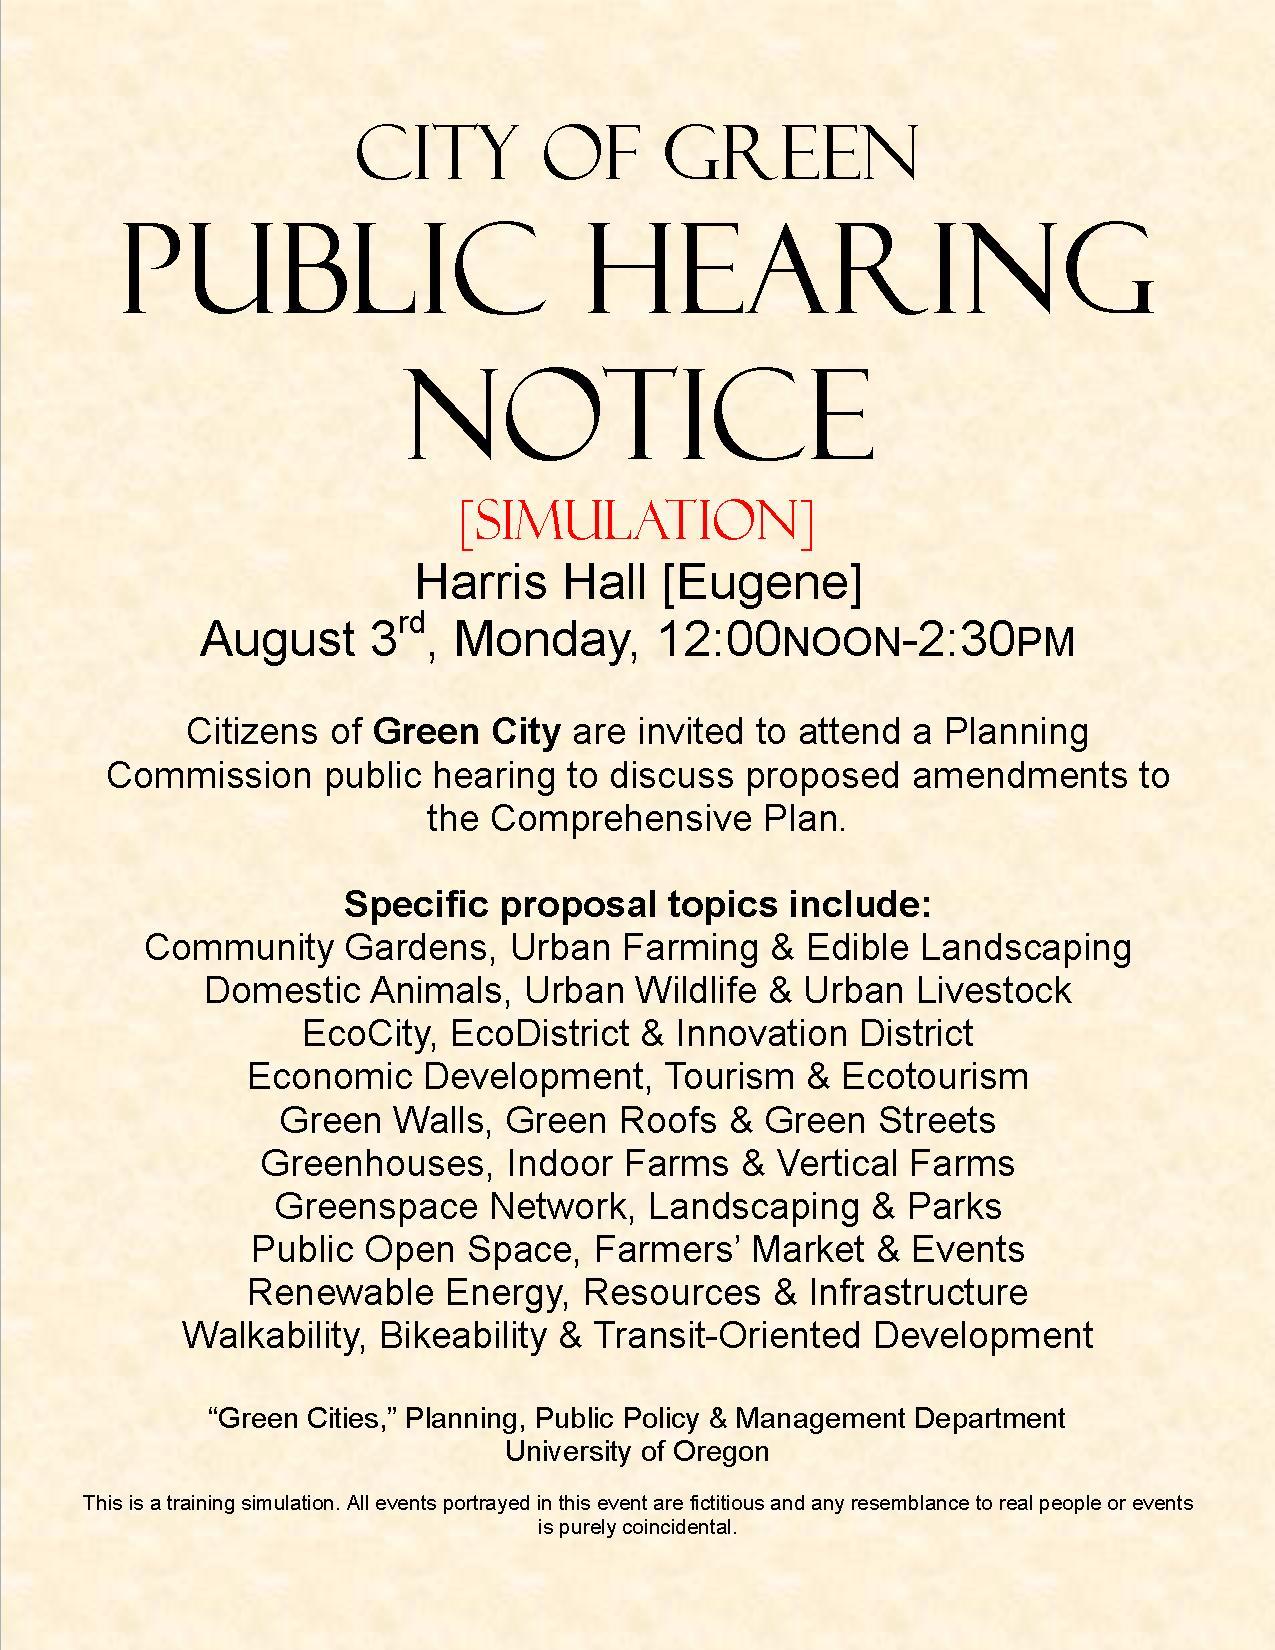 Public Hearing Simulation